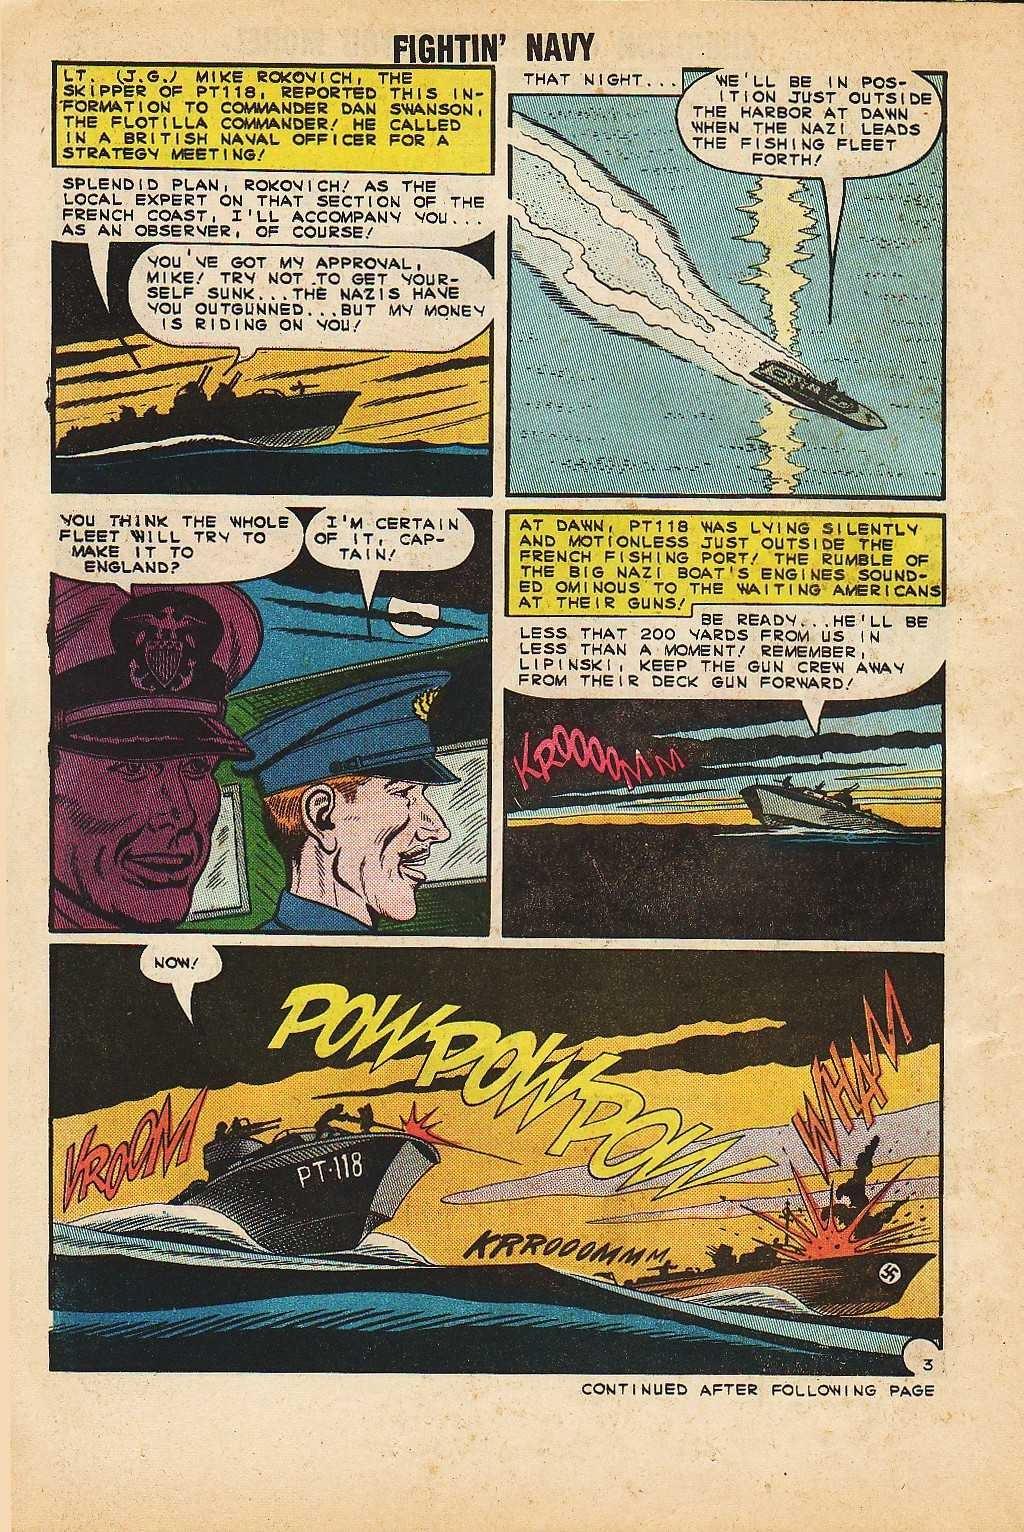 Read online Fightin' Navy comic -  Issue #116 - 14